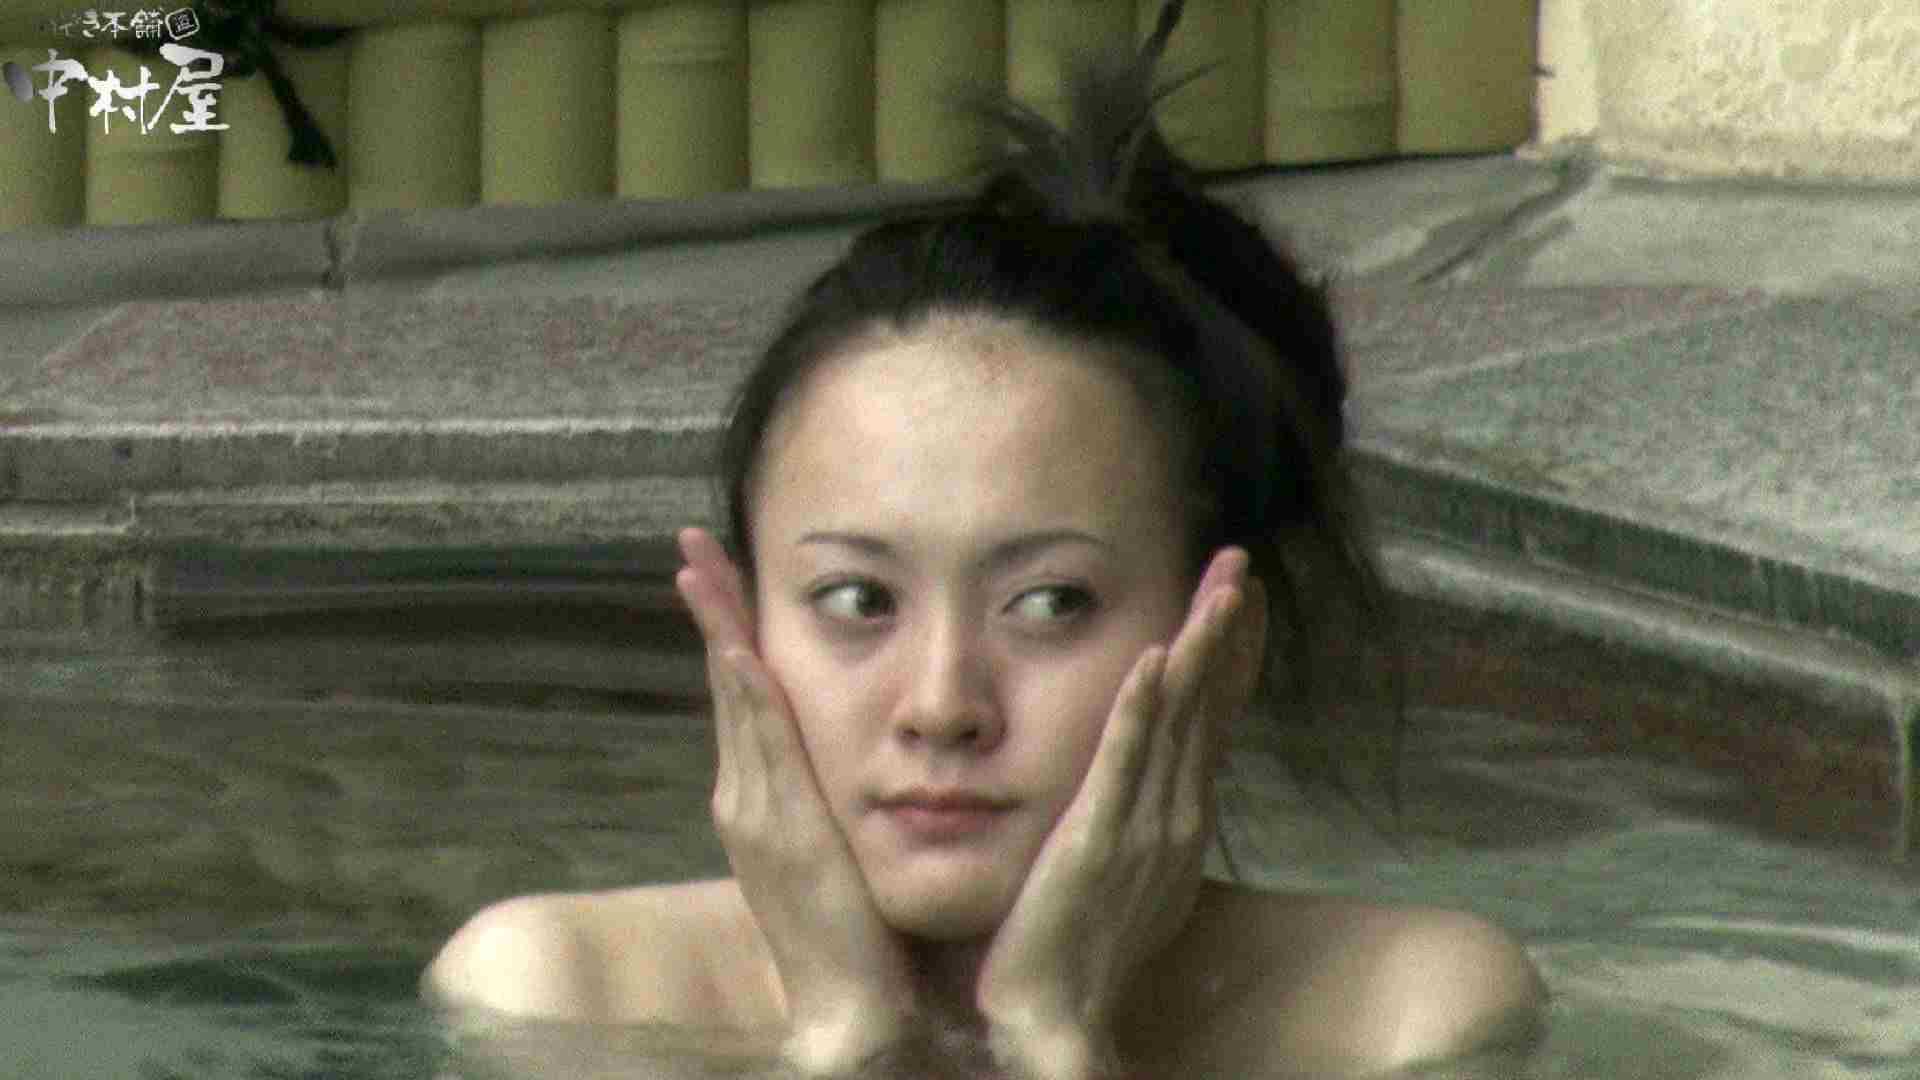 Aquaな露天風呂Vol.900 美しいOLの裸体   露天風呂突入  86pic 4